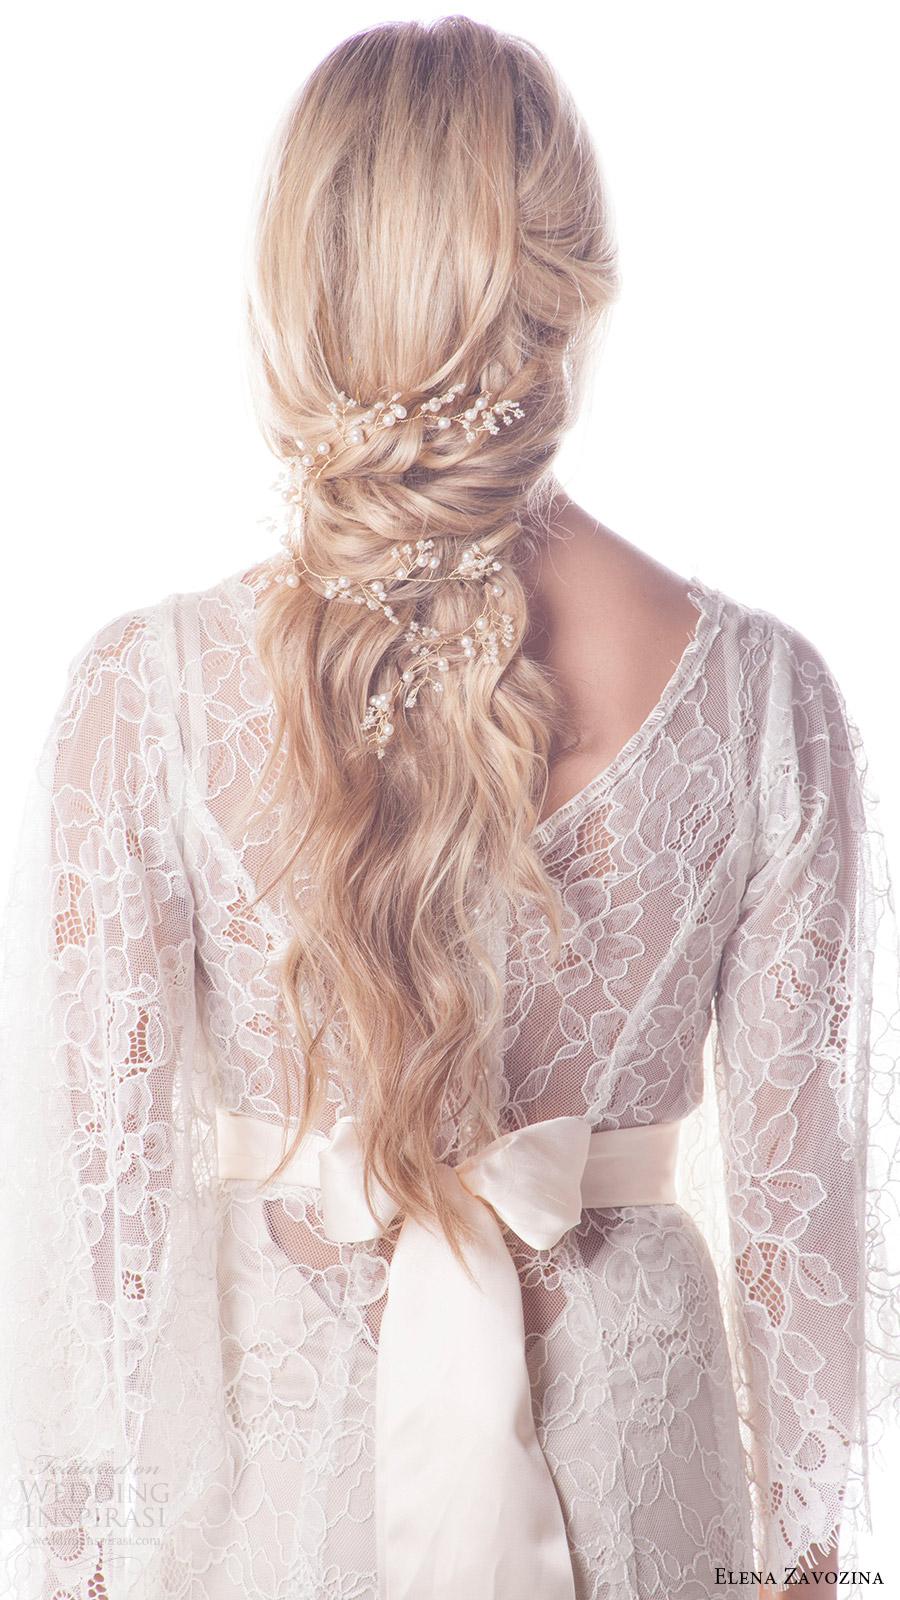 elena zavozina bridal accessories 2016 wedding accessories belts bv romantic hair